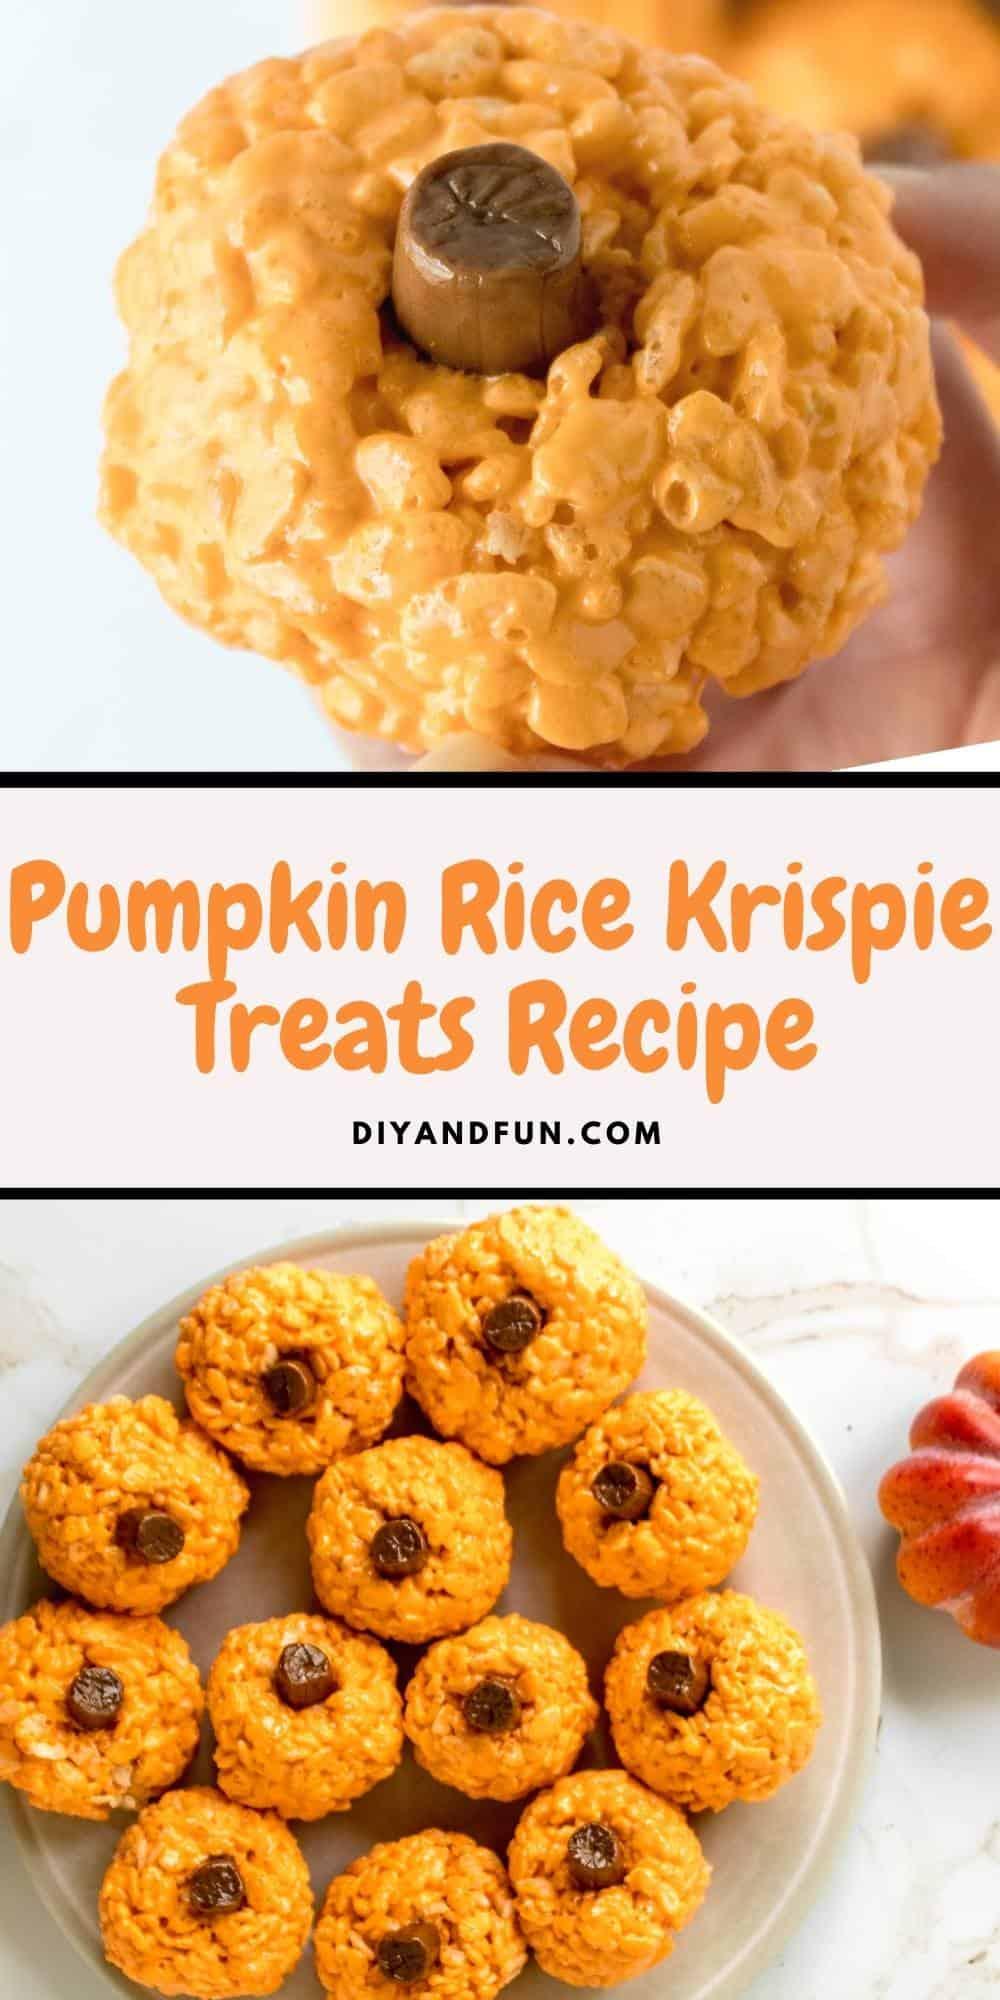 Pumpkin Rice Krispie Treats Recipe